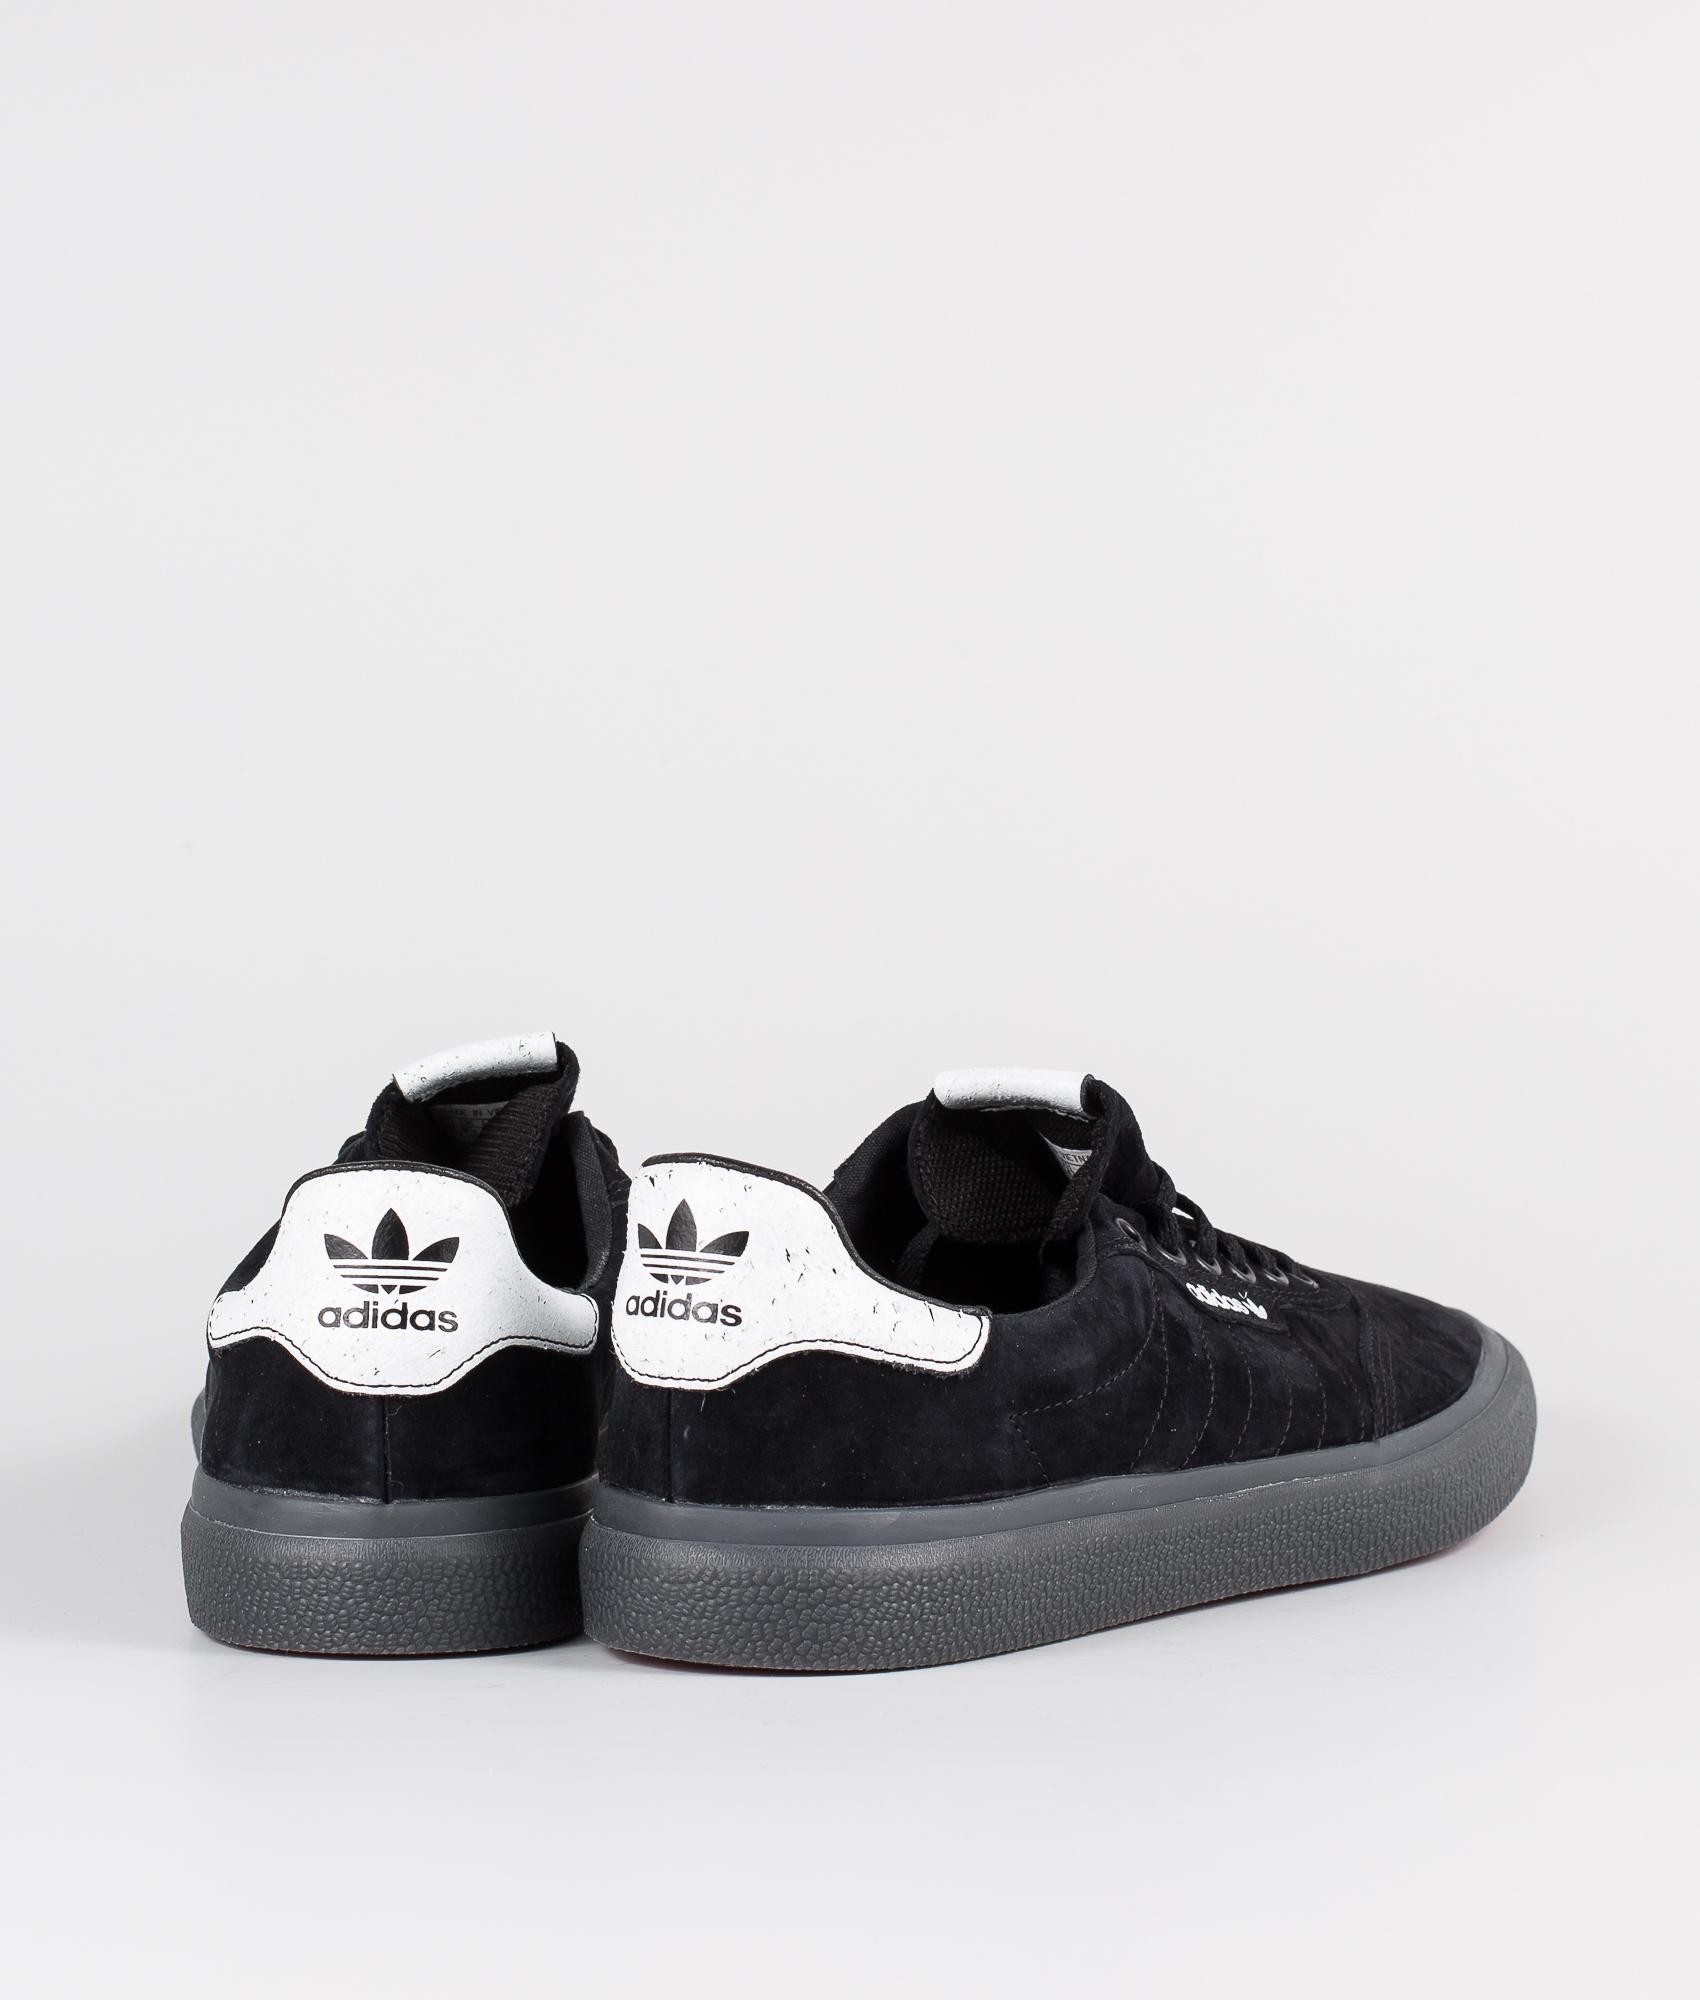 Adidas Originals 3MC Schuhe Core BlackFtw WhiteChsogr